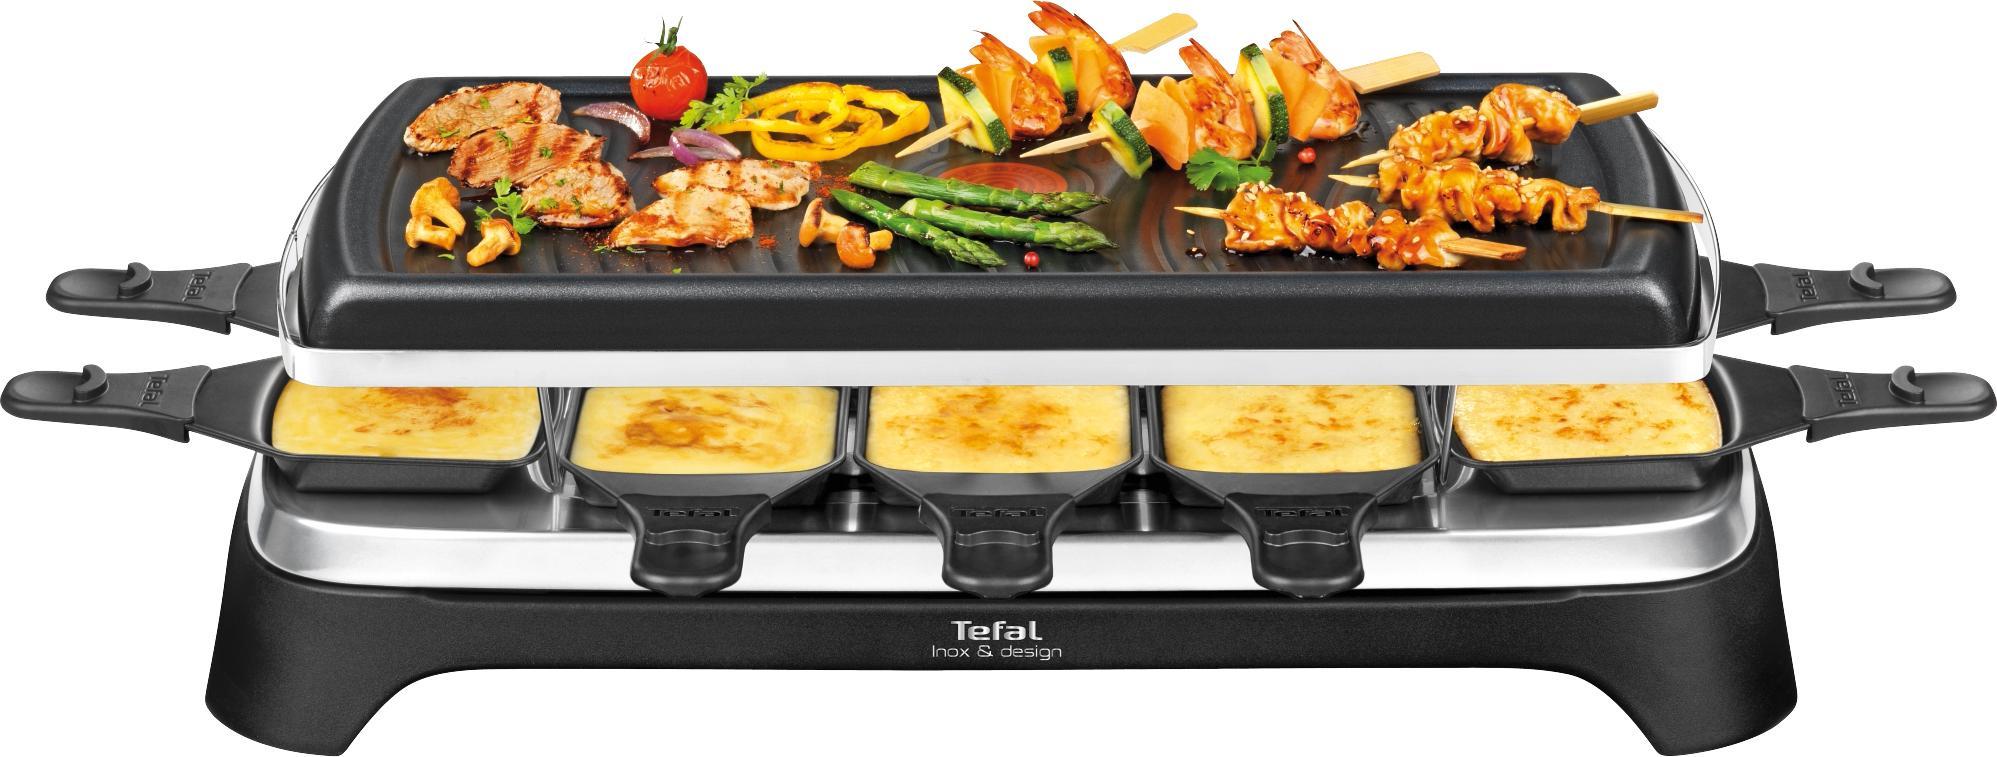 Tefal Raclette RE4588 10 Raclettepfännchen 1350 Watt   Küche und Esszimmer > Küchengeräte > Raclette   Schwarz   Tefal